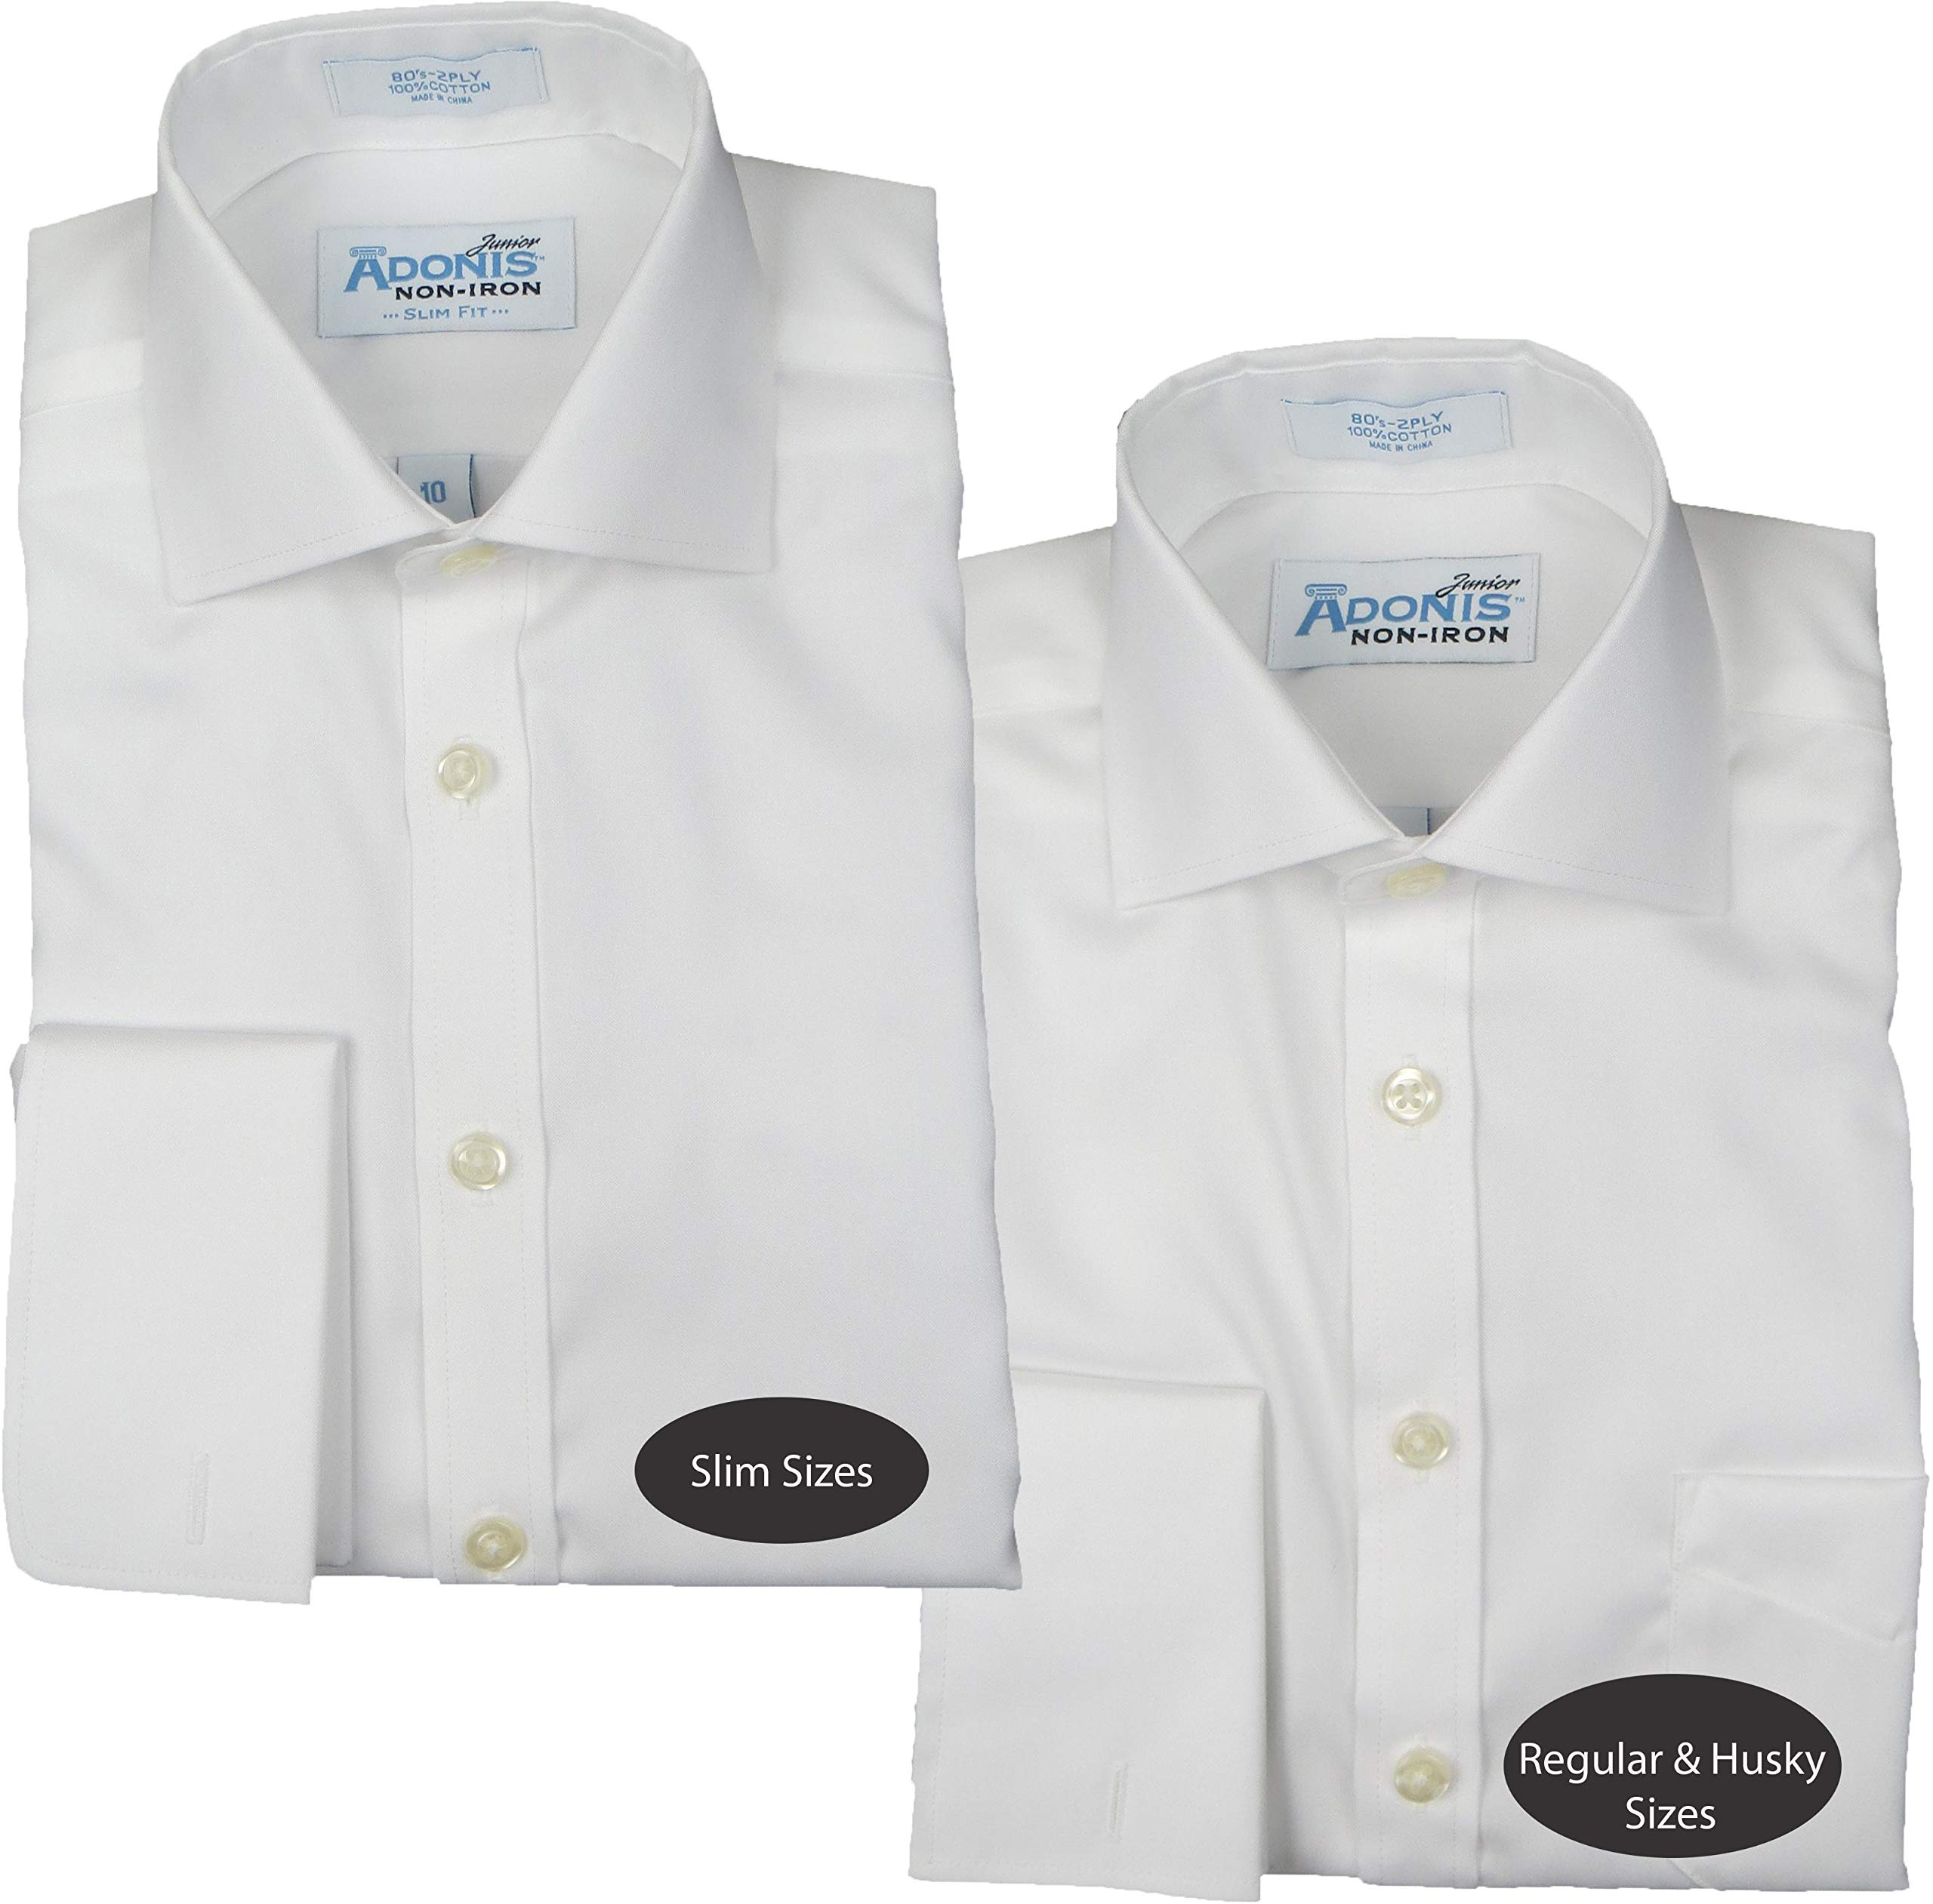 ADONIS Boys 100% Cotton Non Iron White Solid Pinpoint Long Sleeve Dress Shirt - White, 12 Husky